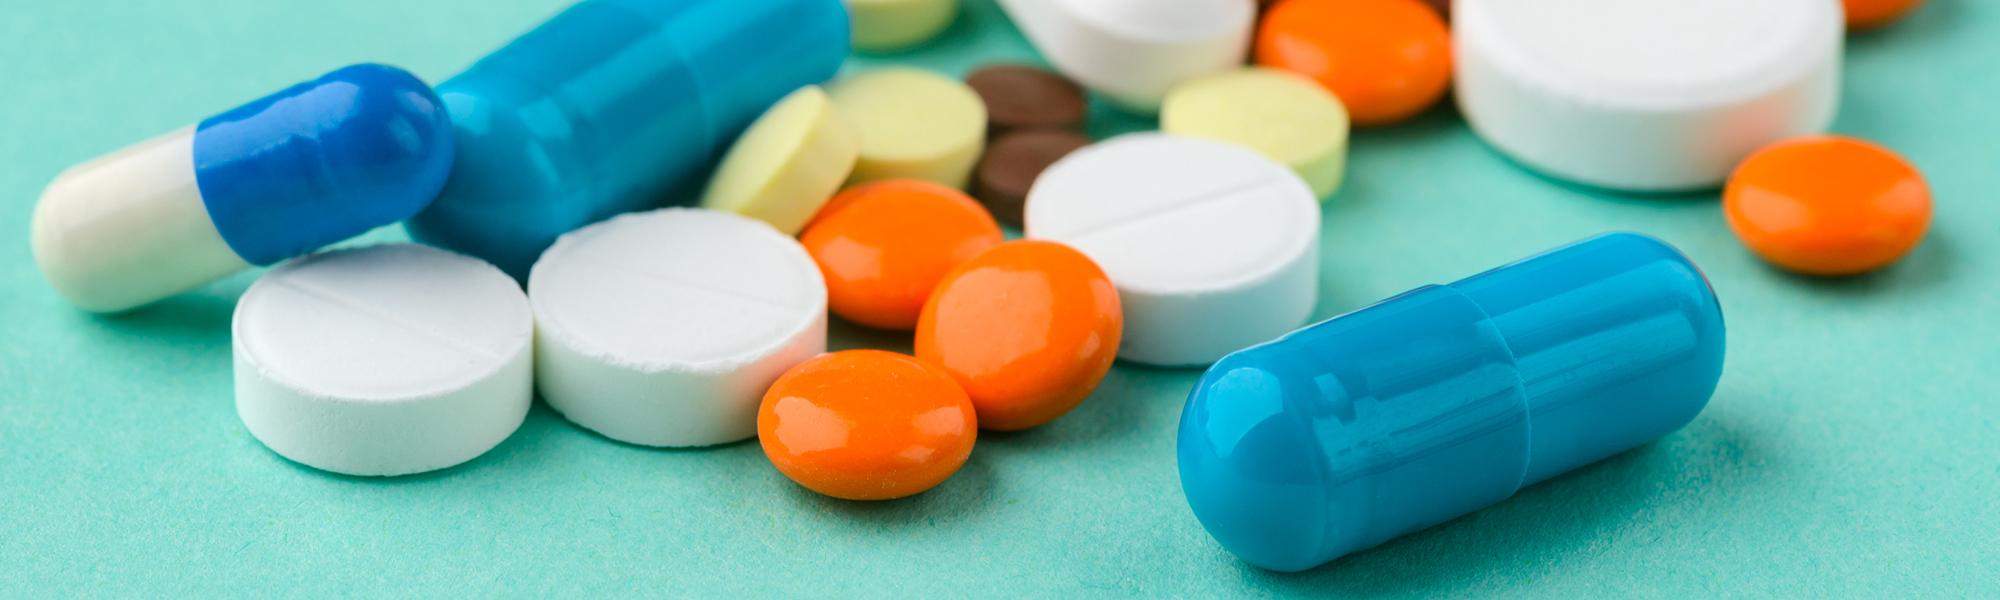 Pills Photo 2000X600